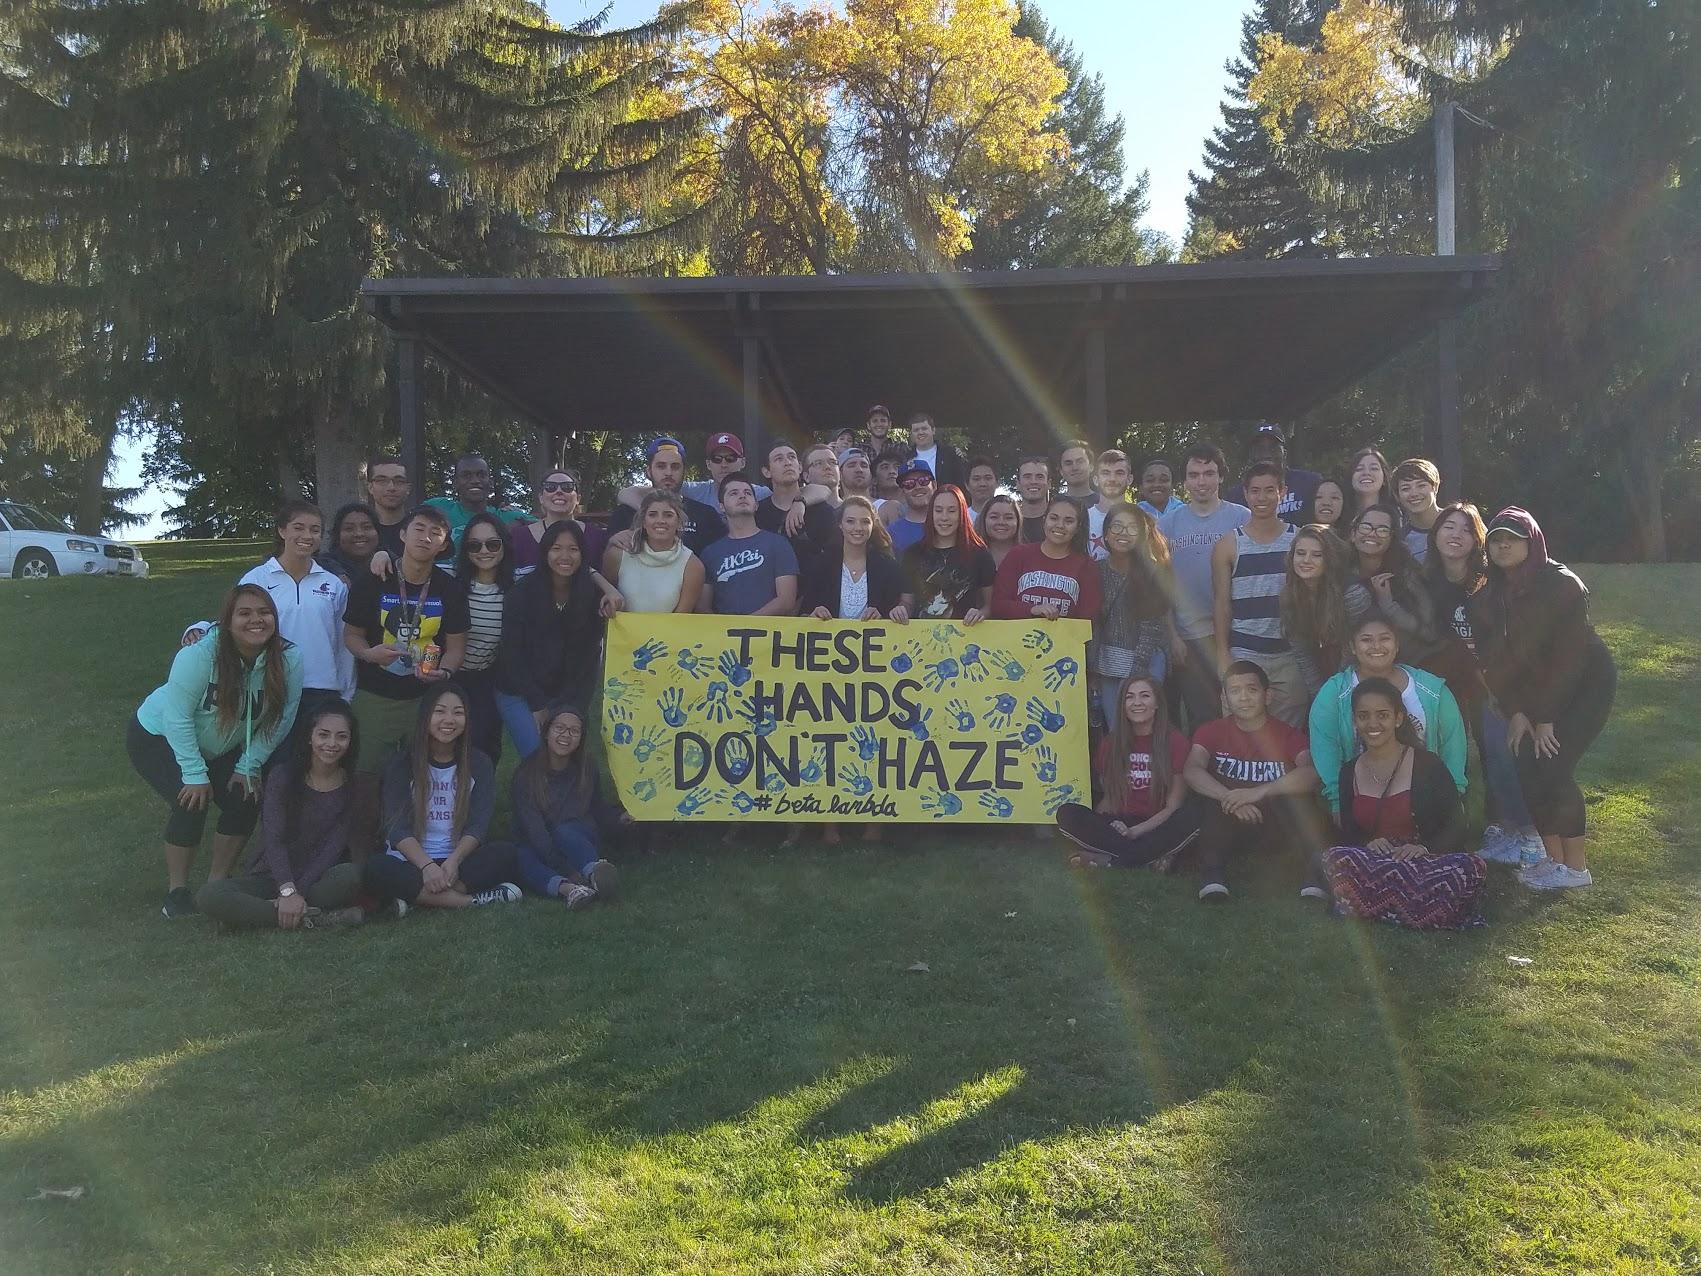 National Hazing Prevention Week / Corn Roast in the Park Brotherhood